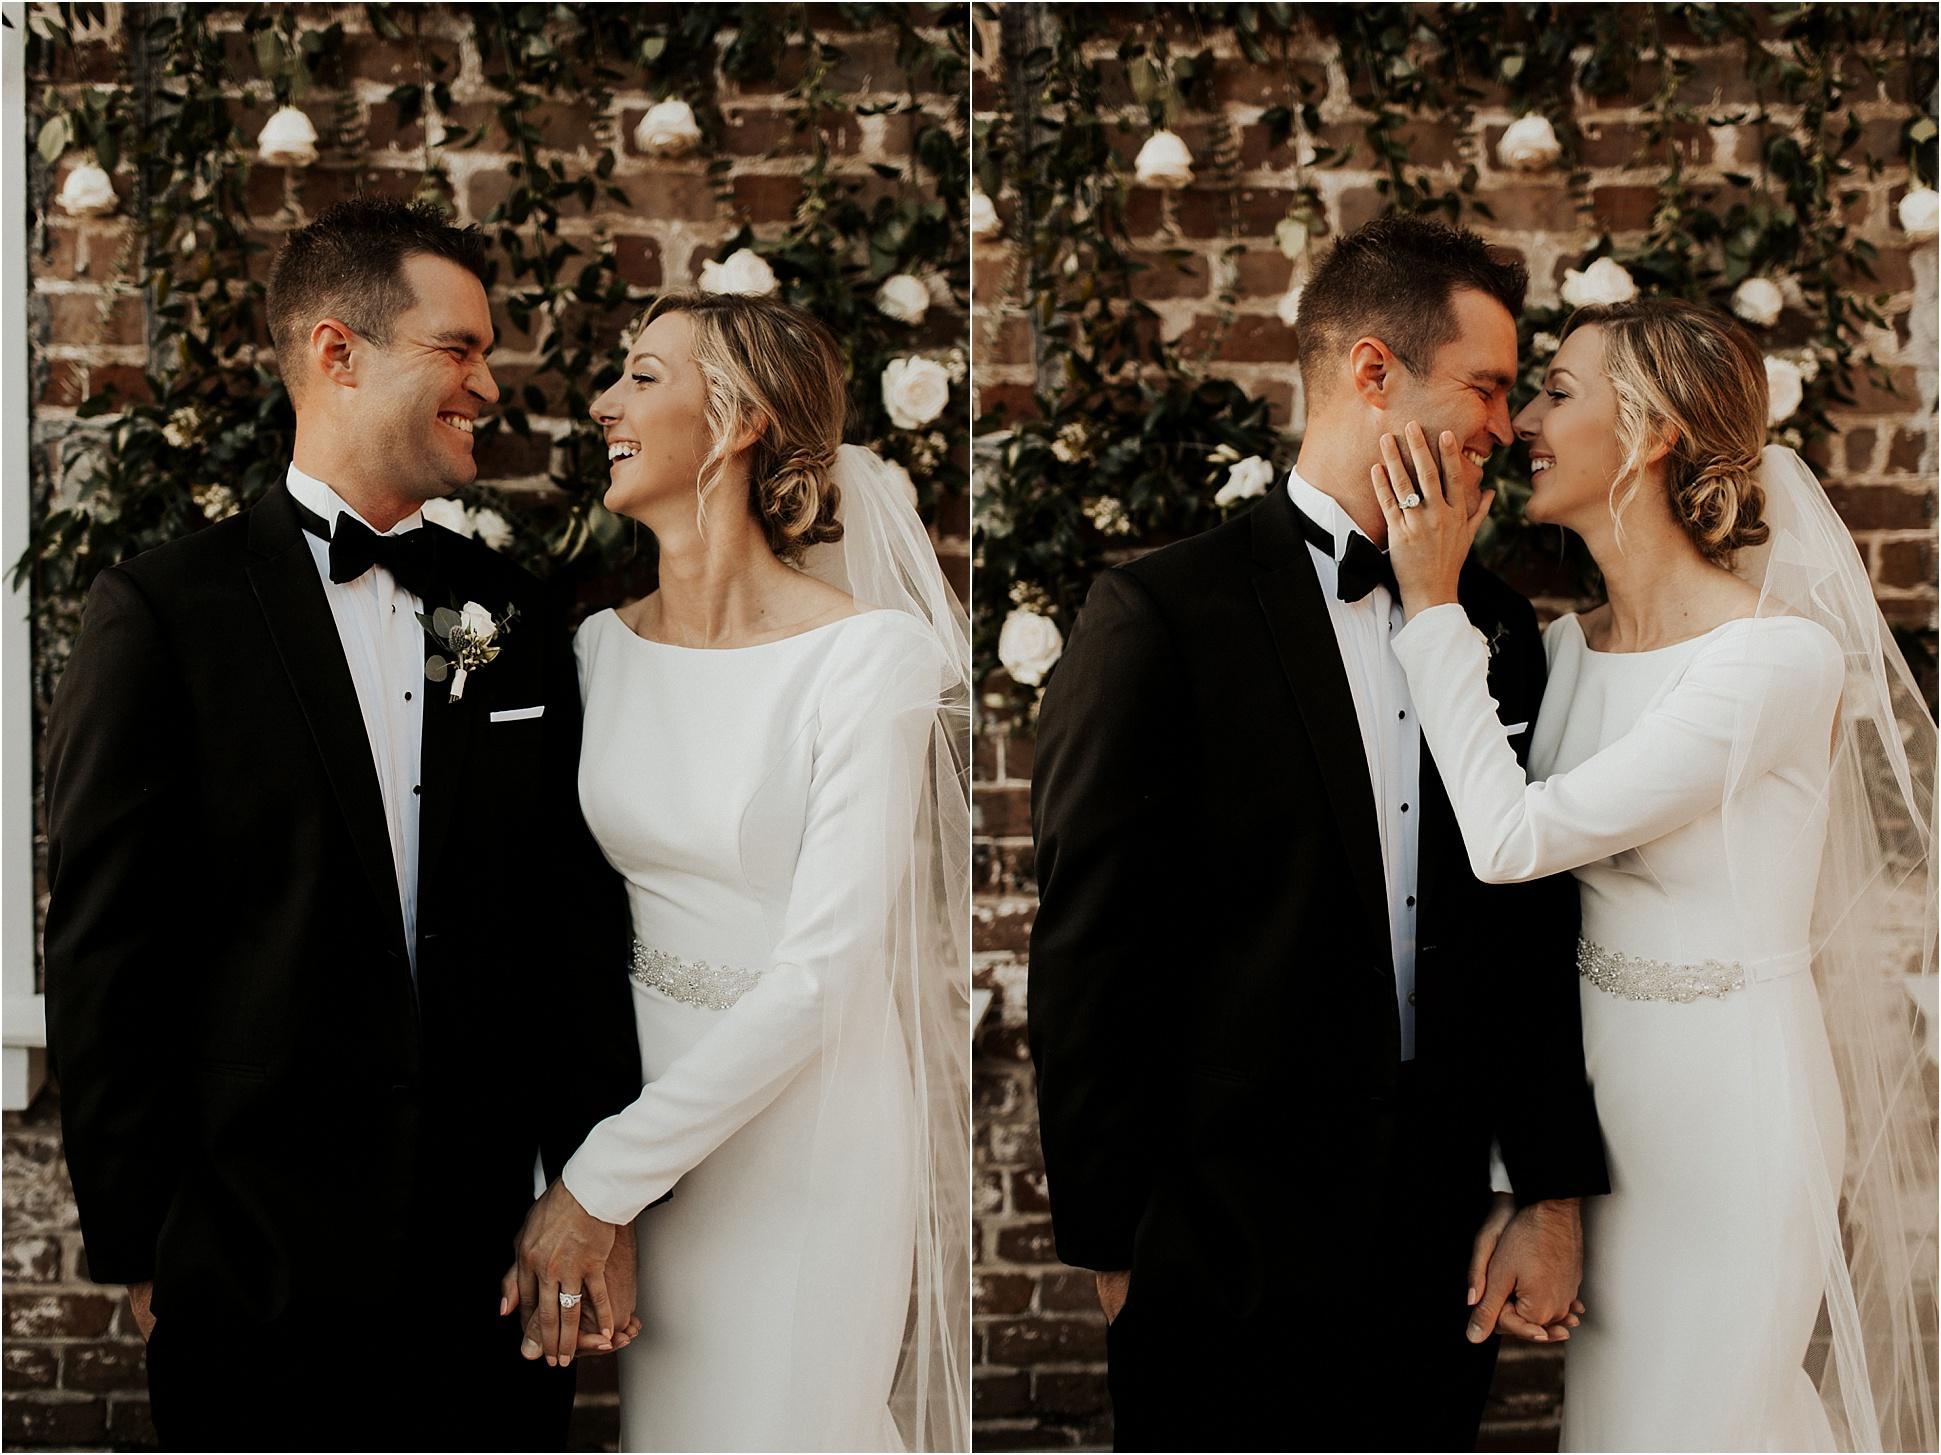 upstairs_midtown_intimate_charleston_wedding056.JPG